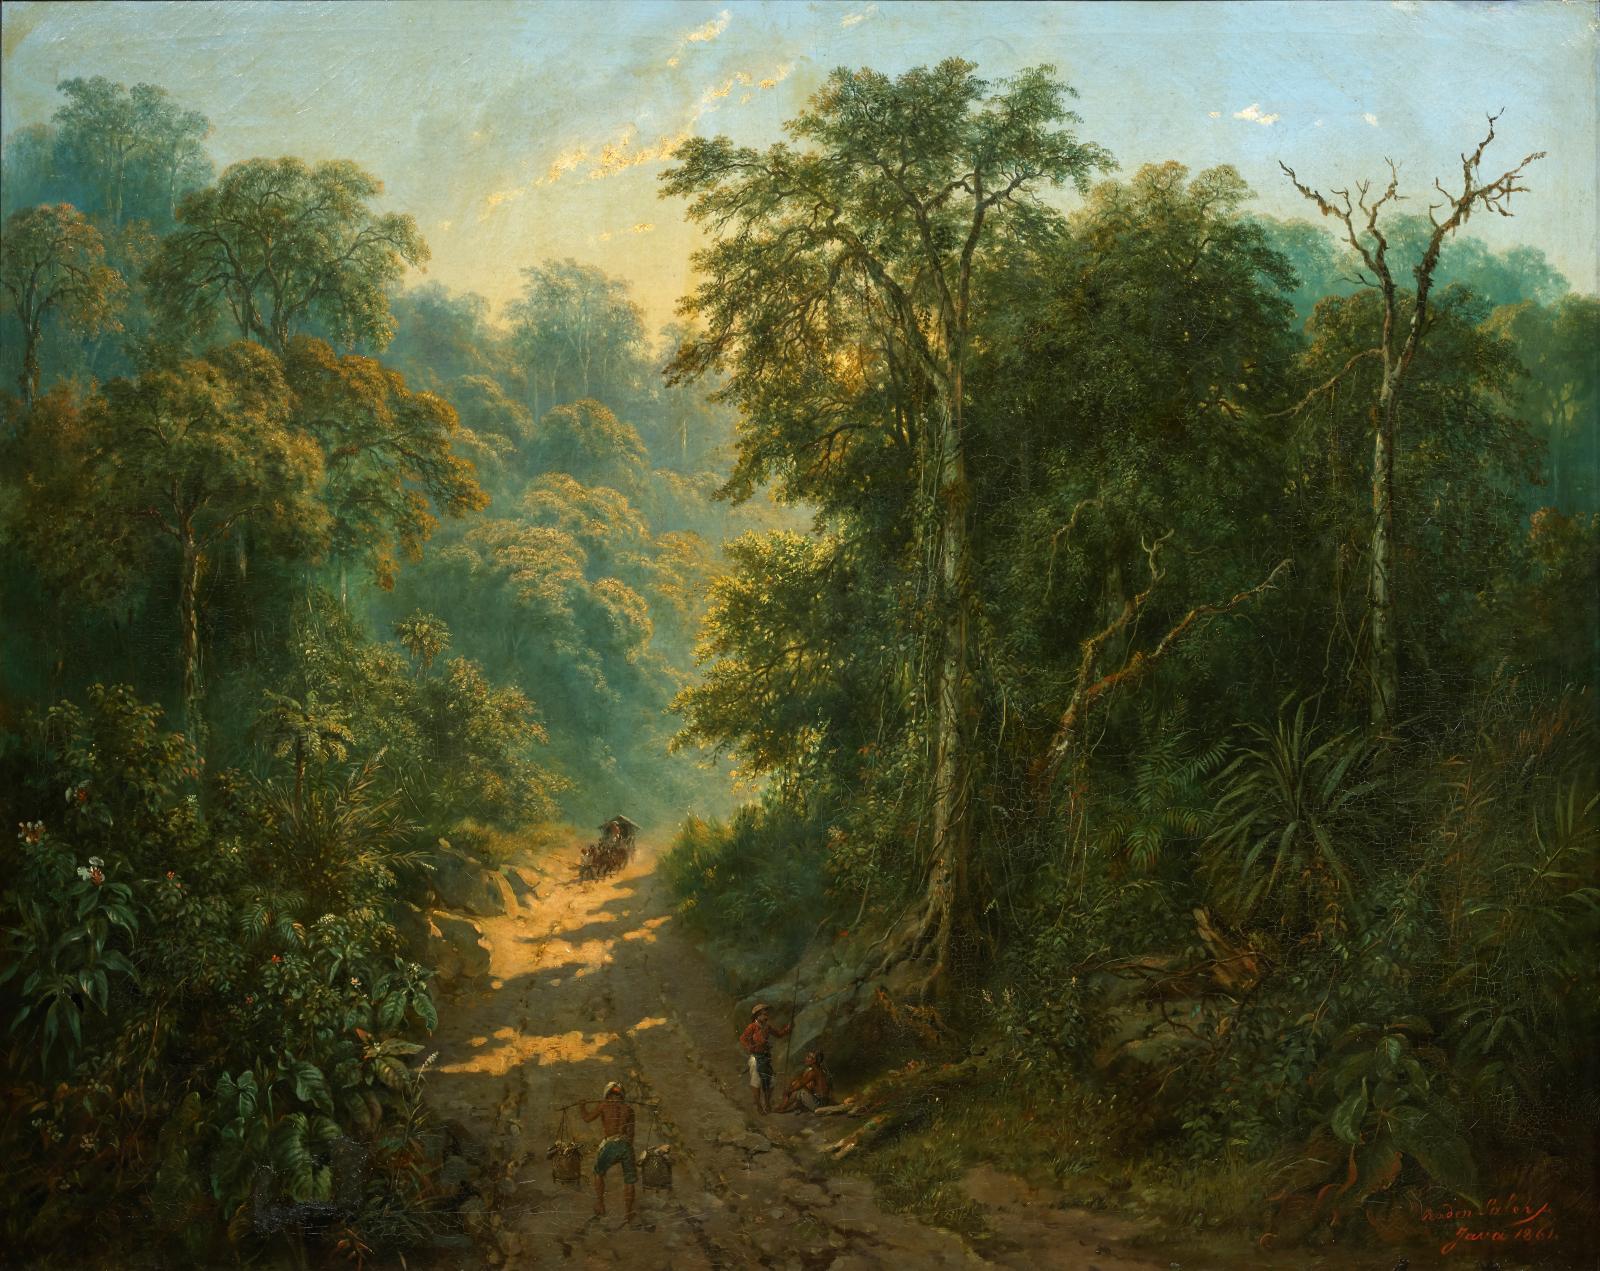 Raden Syarif Bastaman Saleh (1811-1880), Route descendant du mont Megamendung (Road Descending from Mount Megamendung), 1861, oil on canva